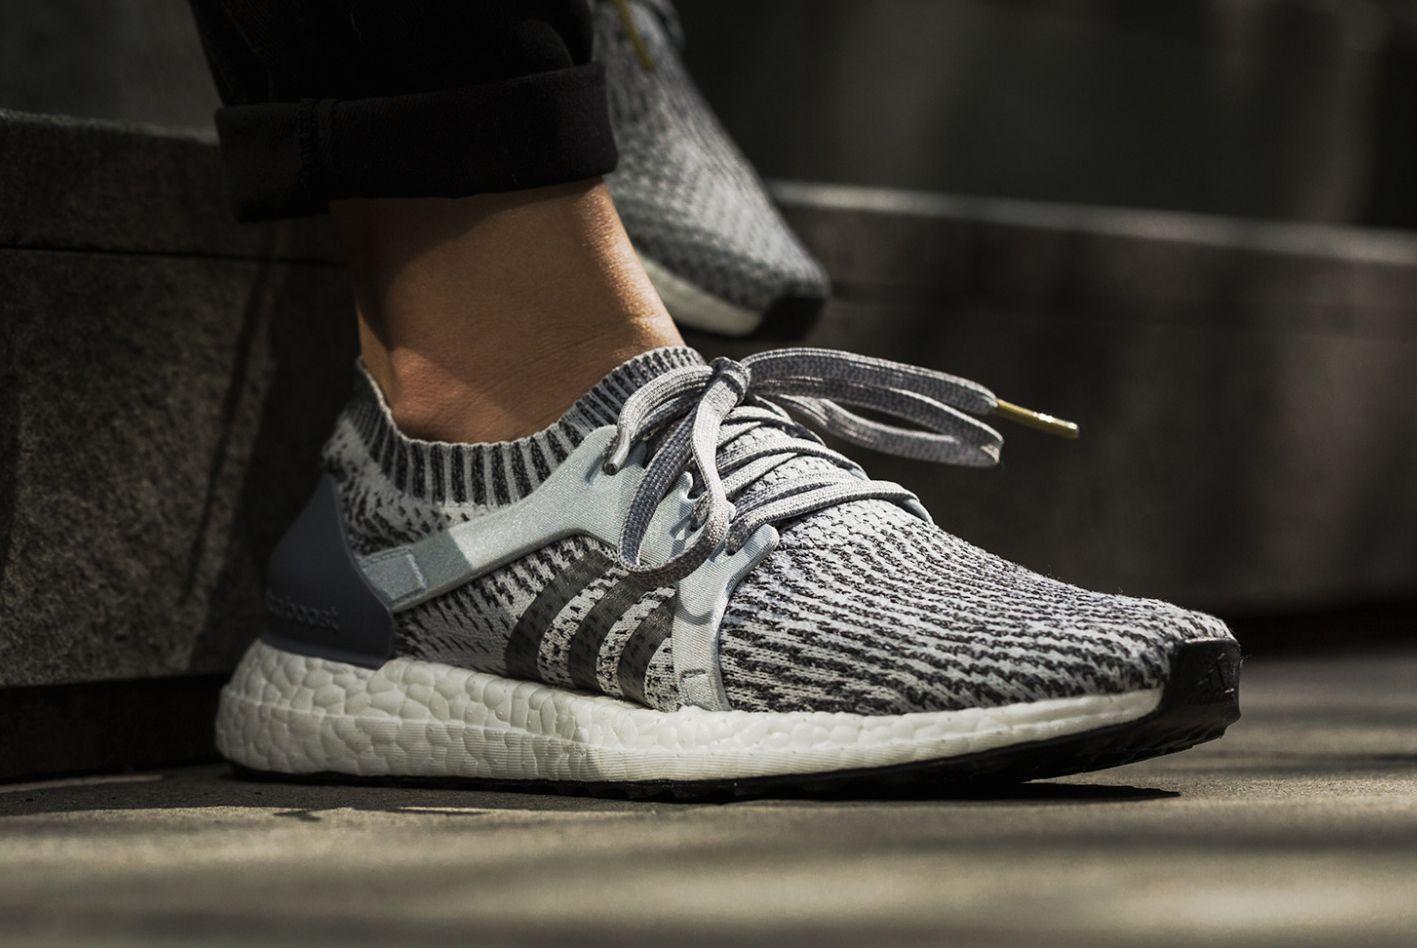 Adidas Ultraboost X Closer Look 1